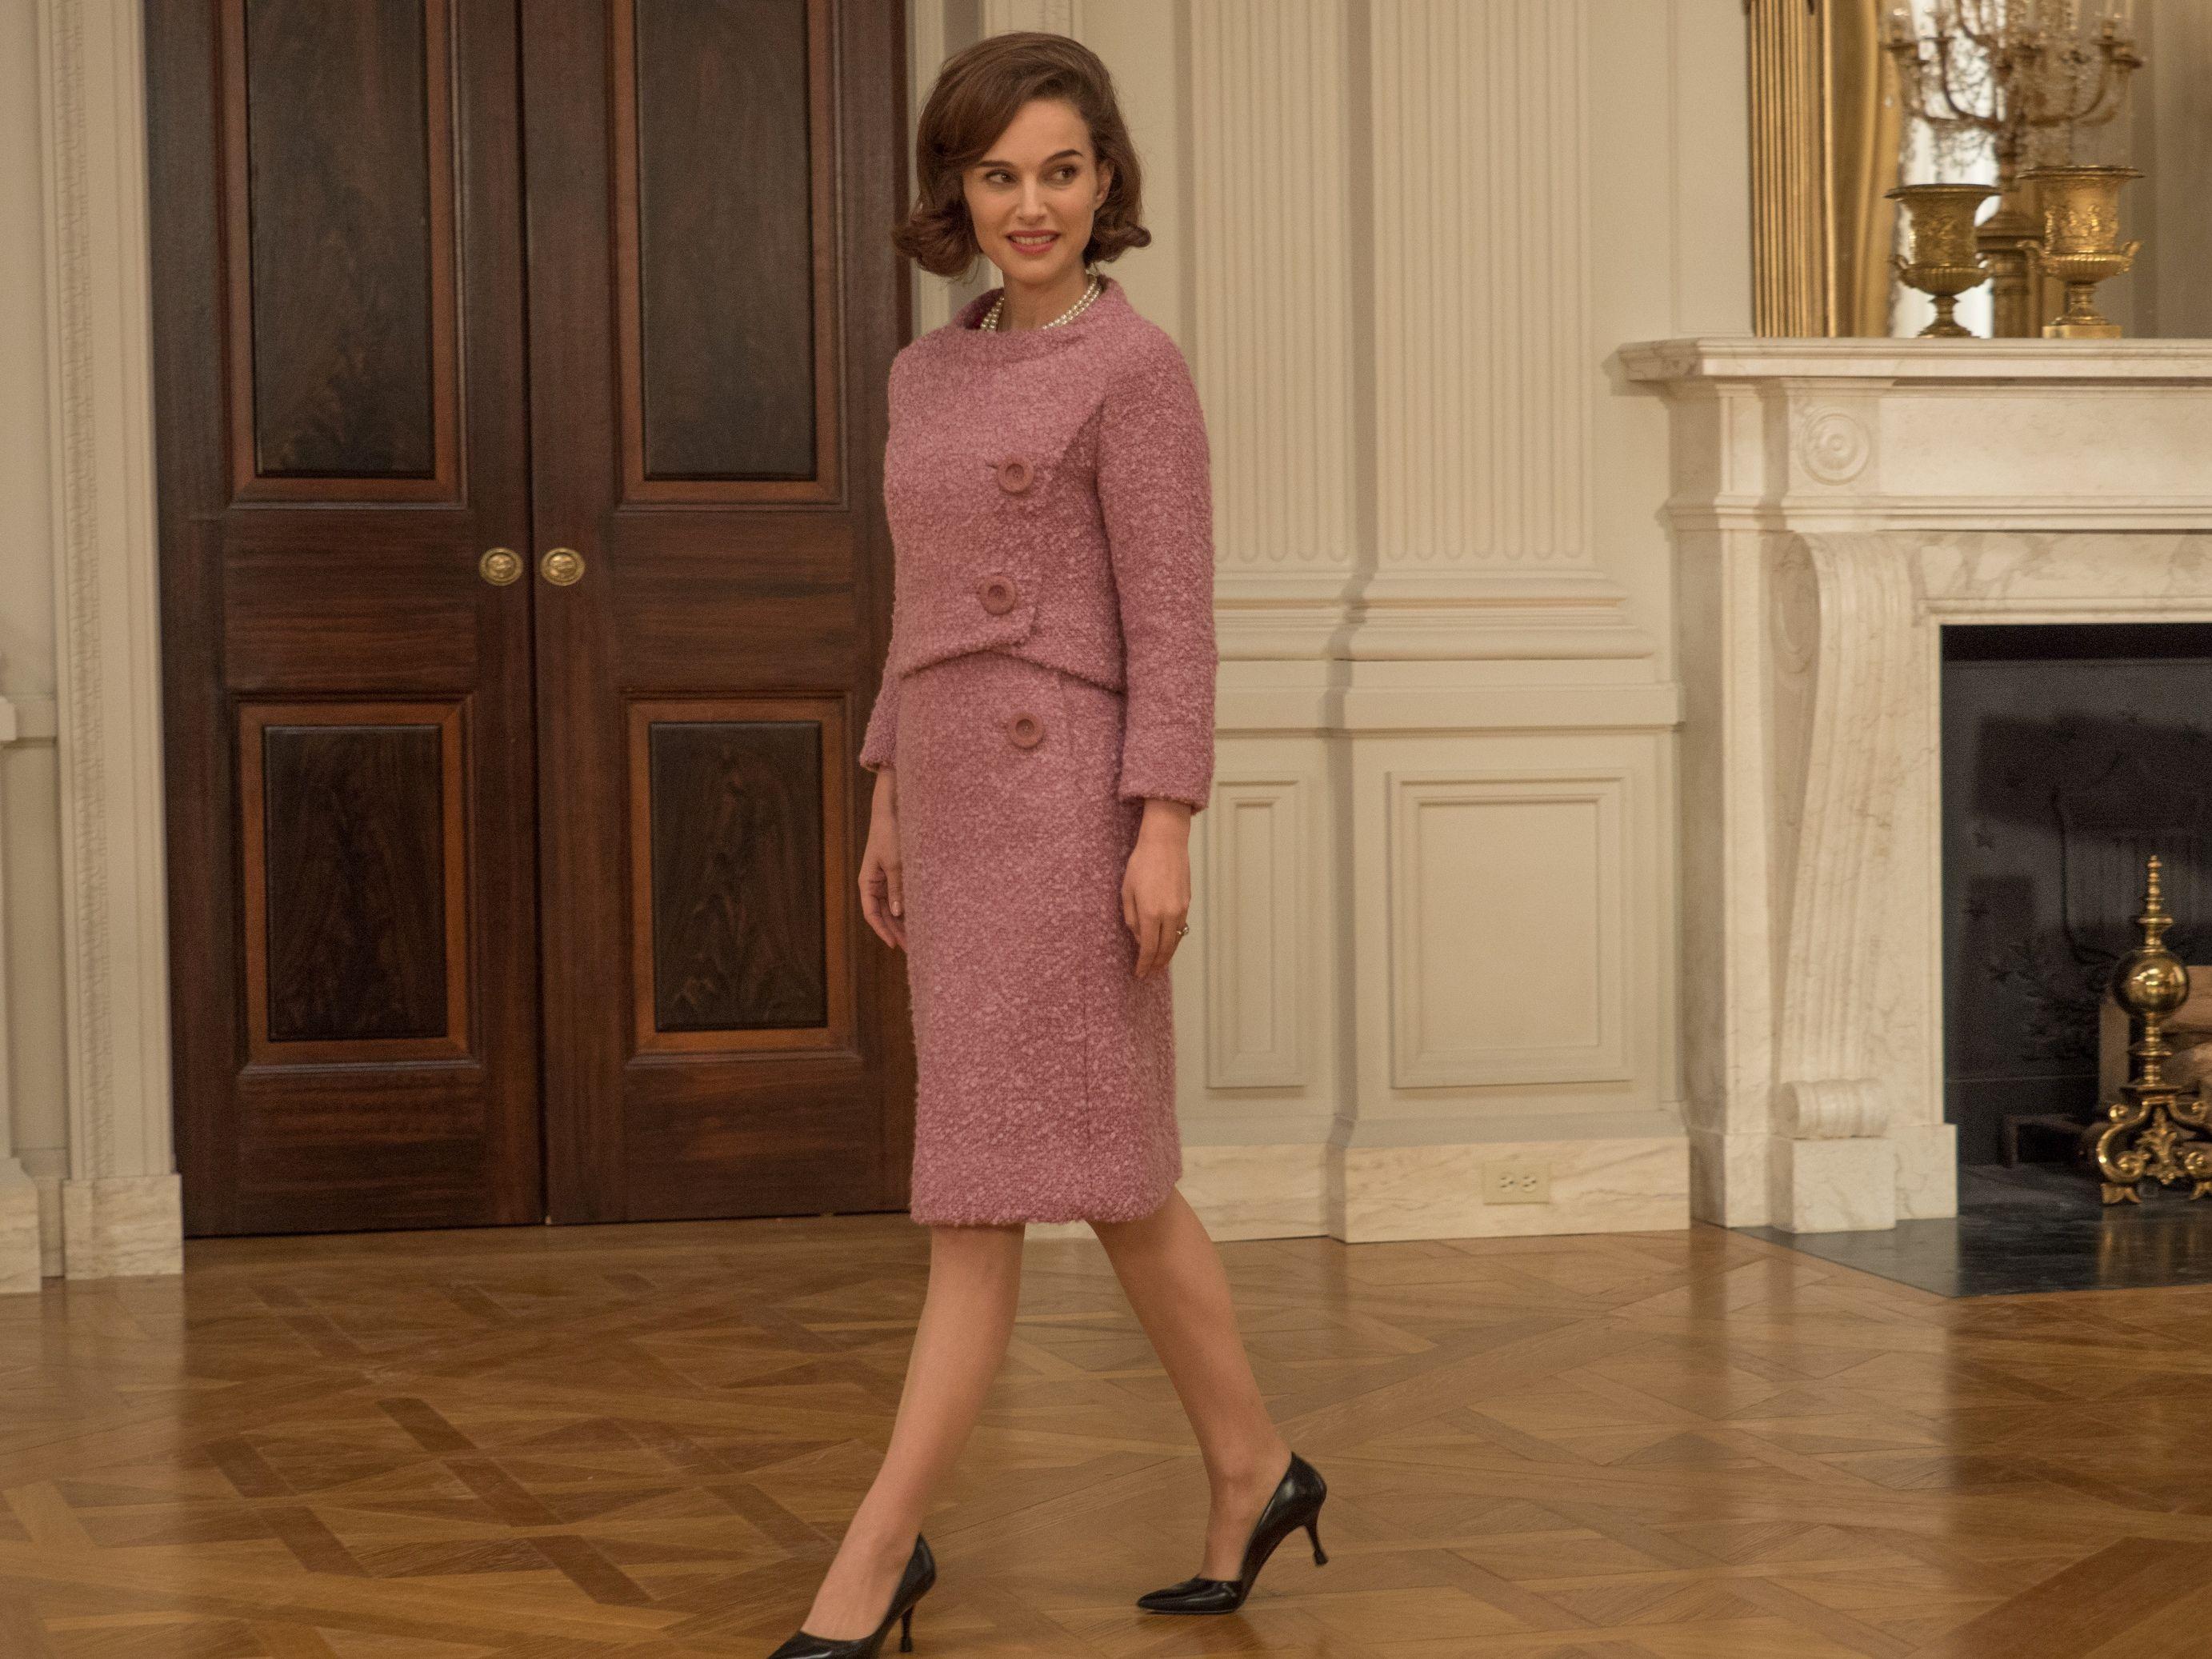 <p>Natalie Portman 曾經演出過許多極具象徵性的角色,而最近期的作品《第一夫人的秘密》更讓她入圍了奧斯卡最佳女主角。電影中,她頂著前第一夫人 Jackie Kennedy 經典的蓬鬆鮑伯頭,設計團隊讓她搖身一變,完美化身為美國傳奇第一夫人。</p>